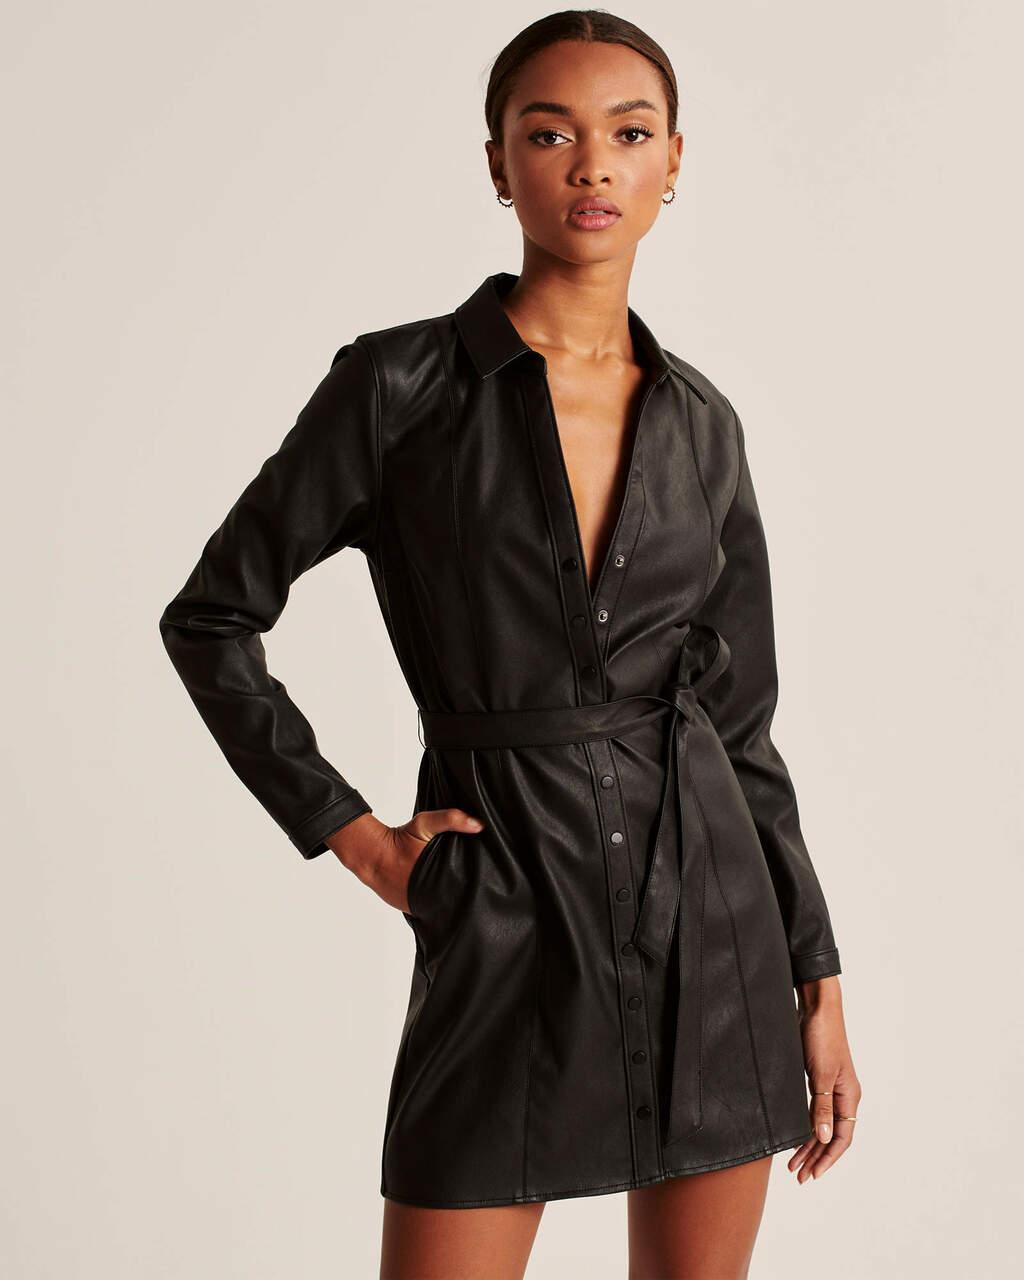 Abercrombie & Fitch Black Faux Leather Shirt Dress